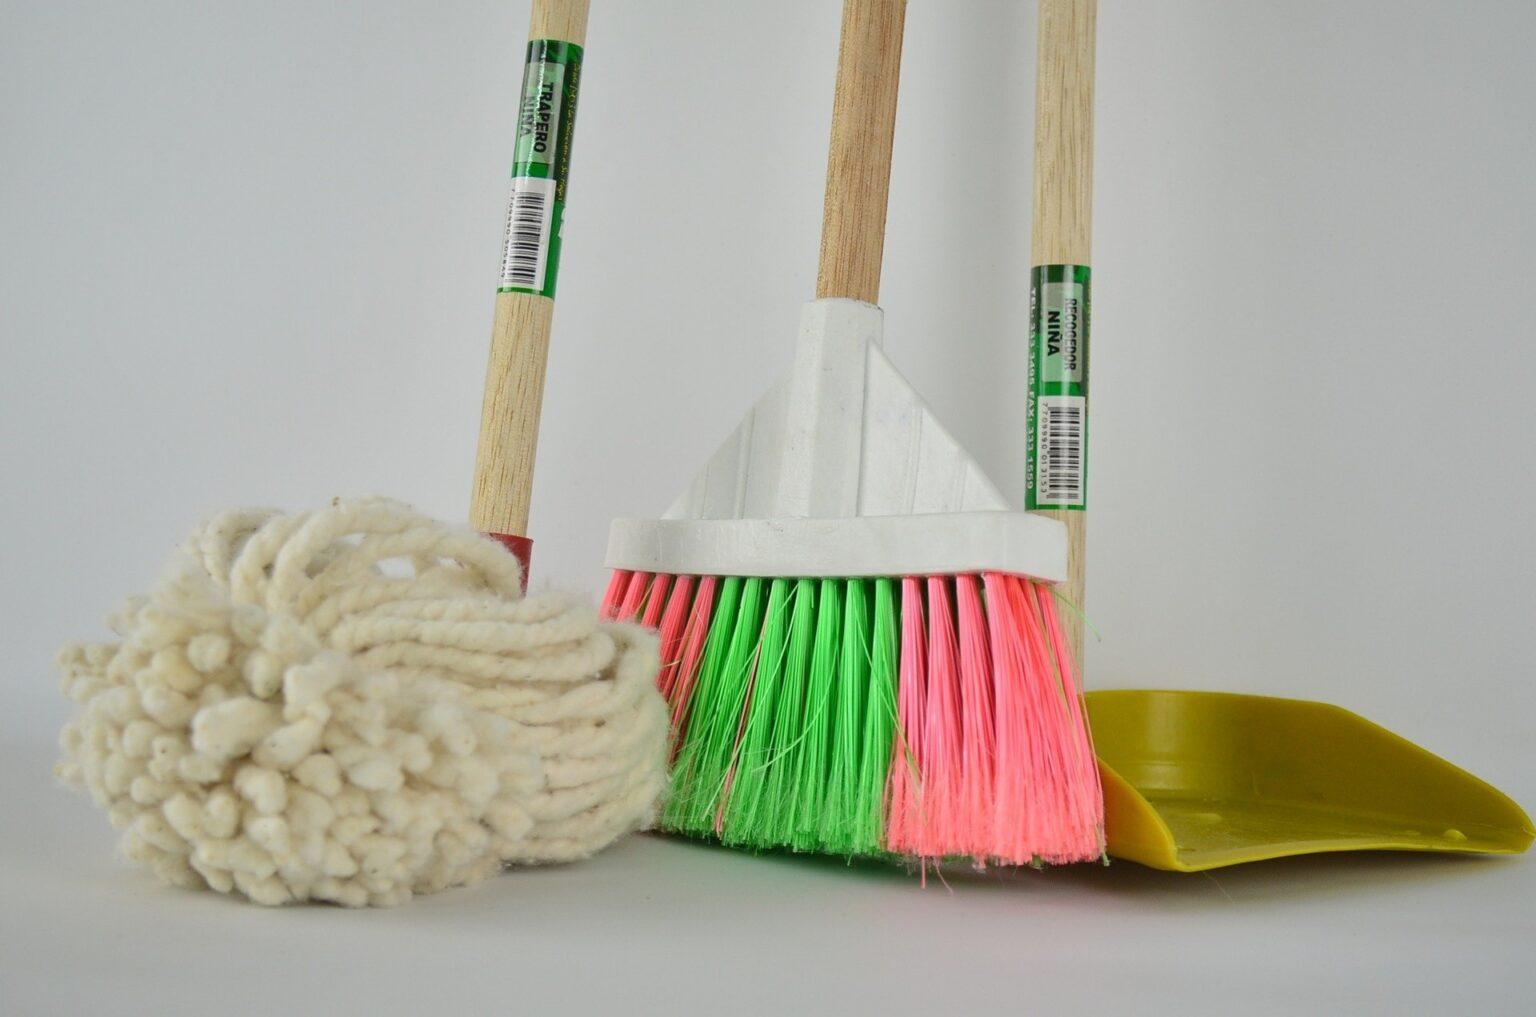 broom-g2ac687966_1920